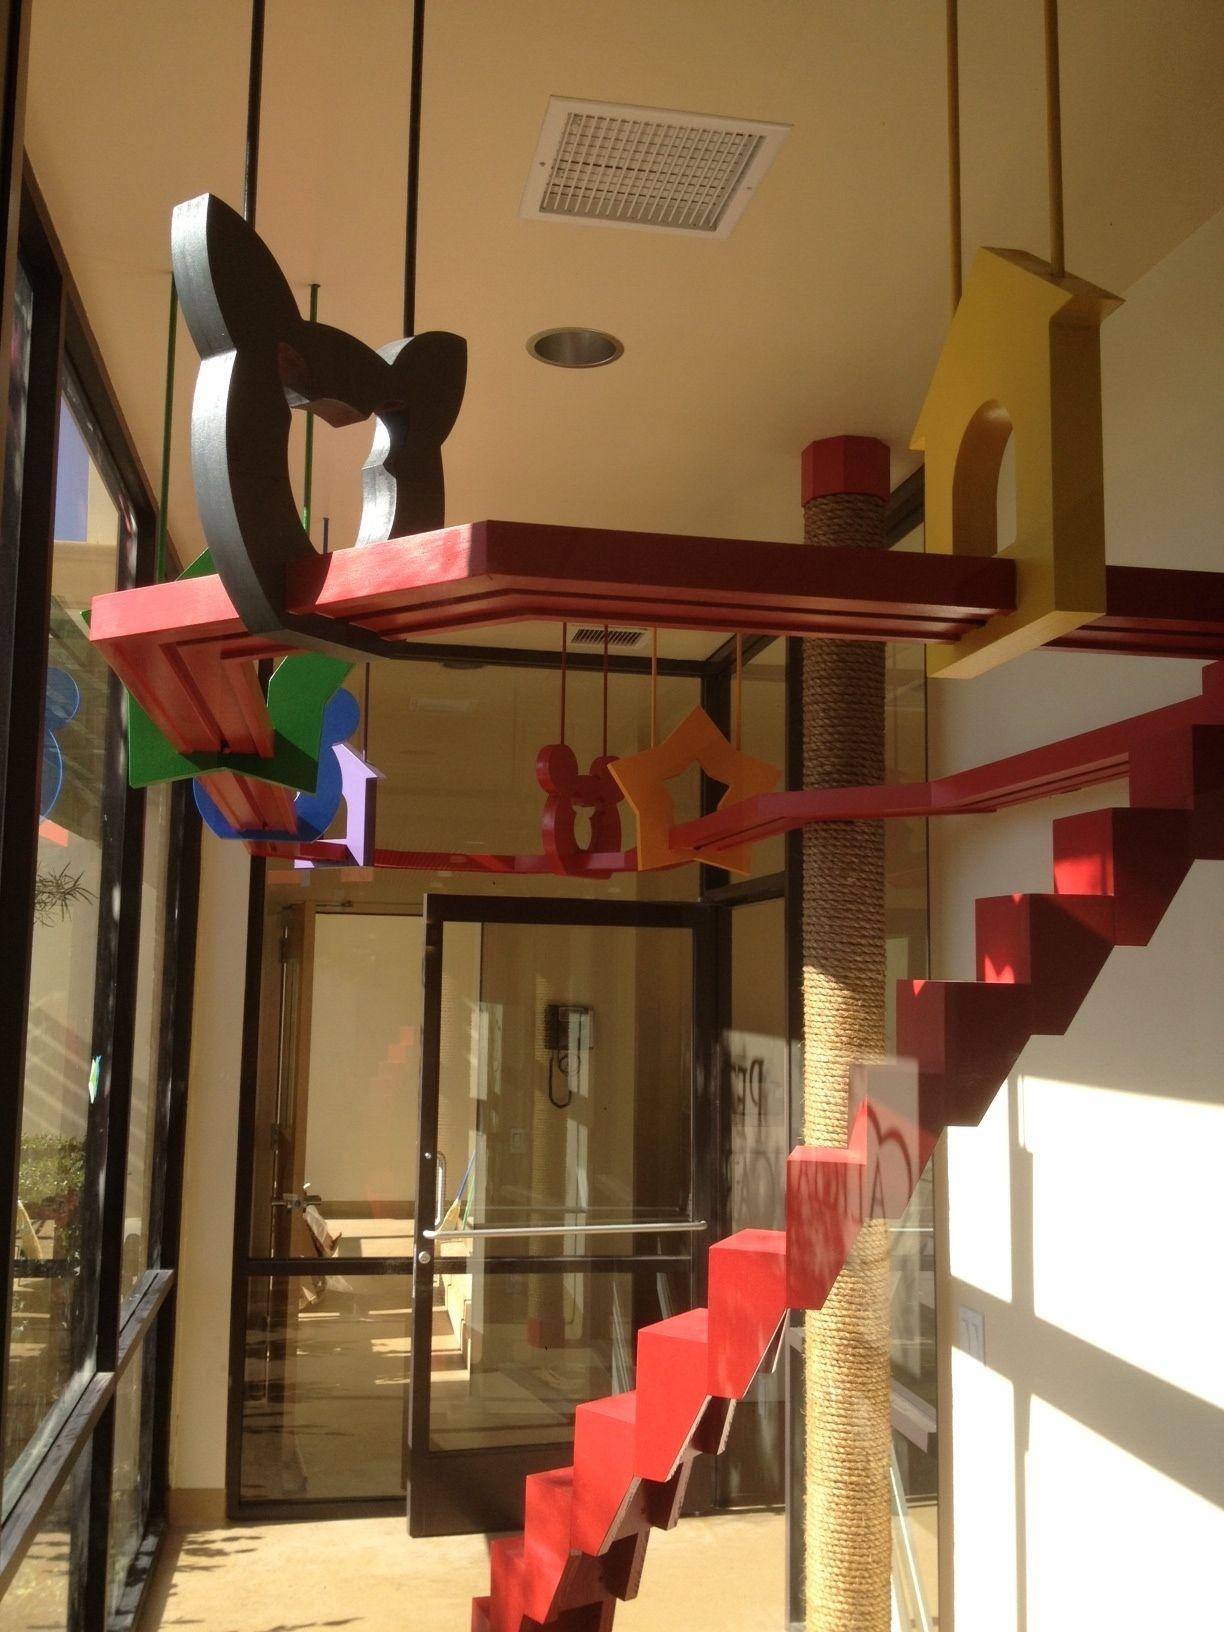 Alicia Pet Care Center Mission Viejo, CA Rauhaus